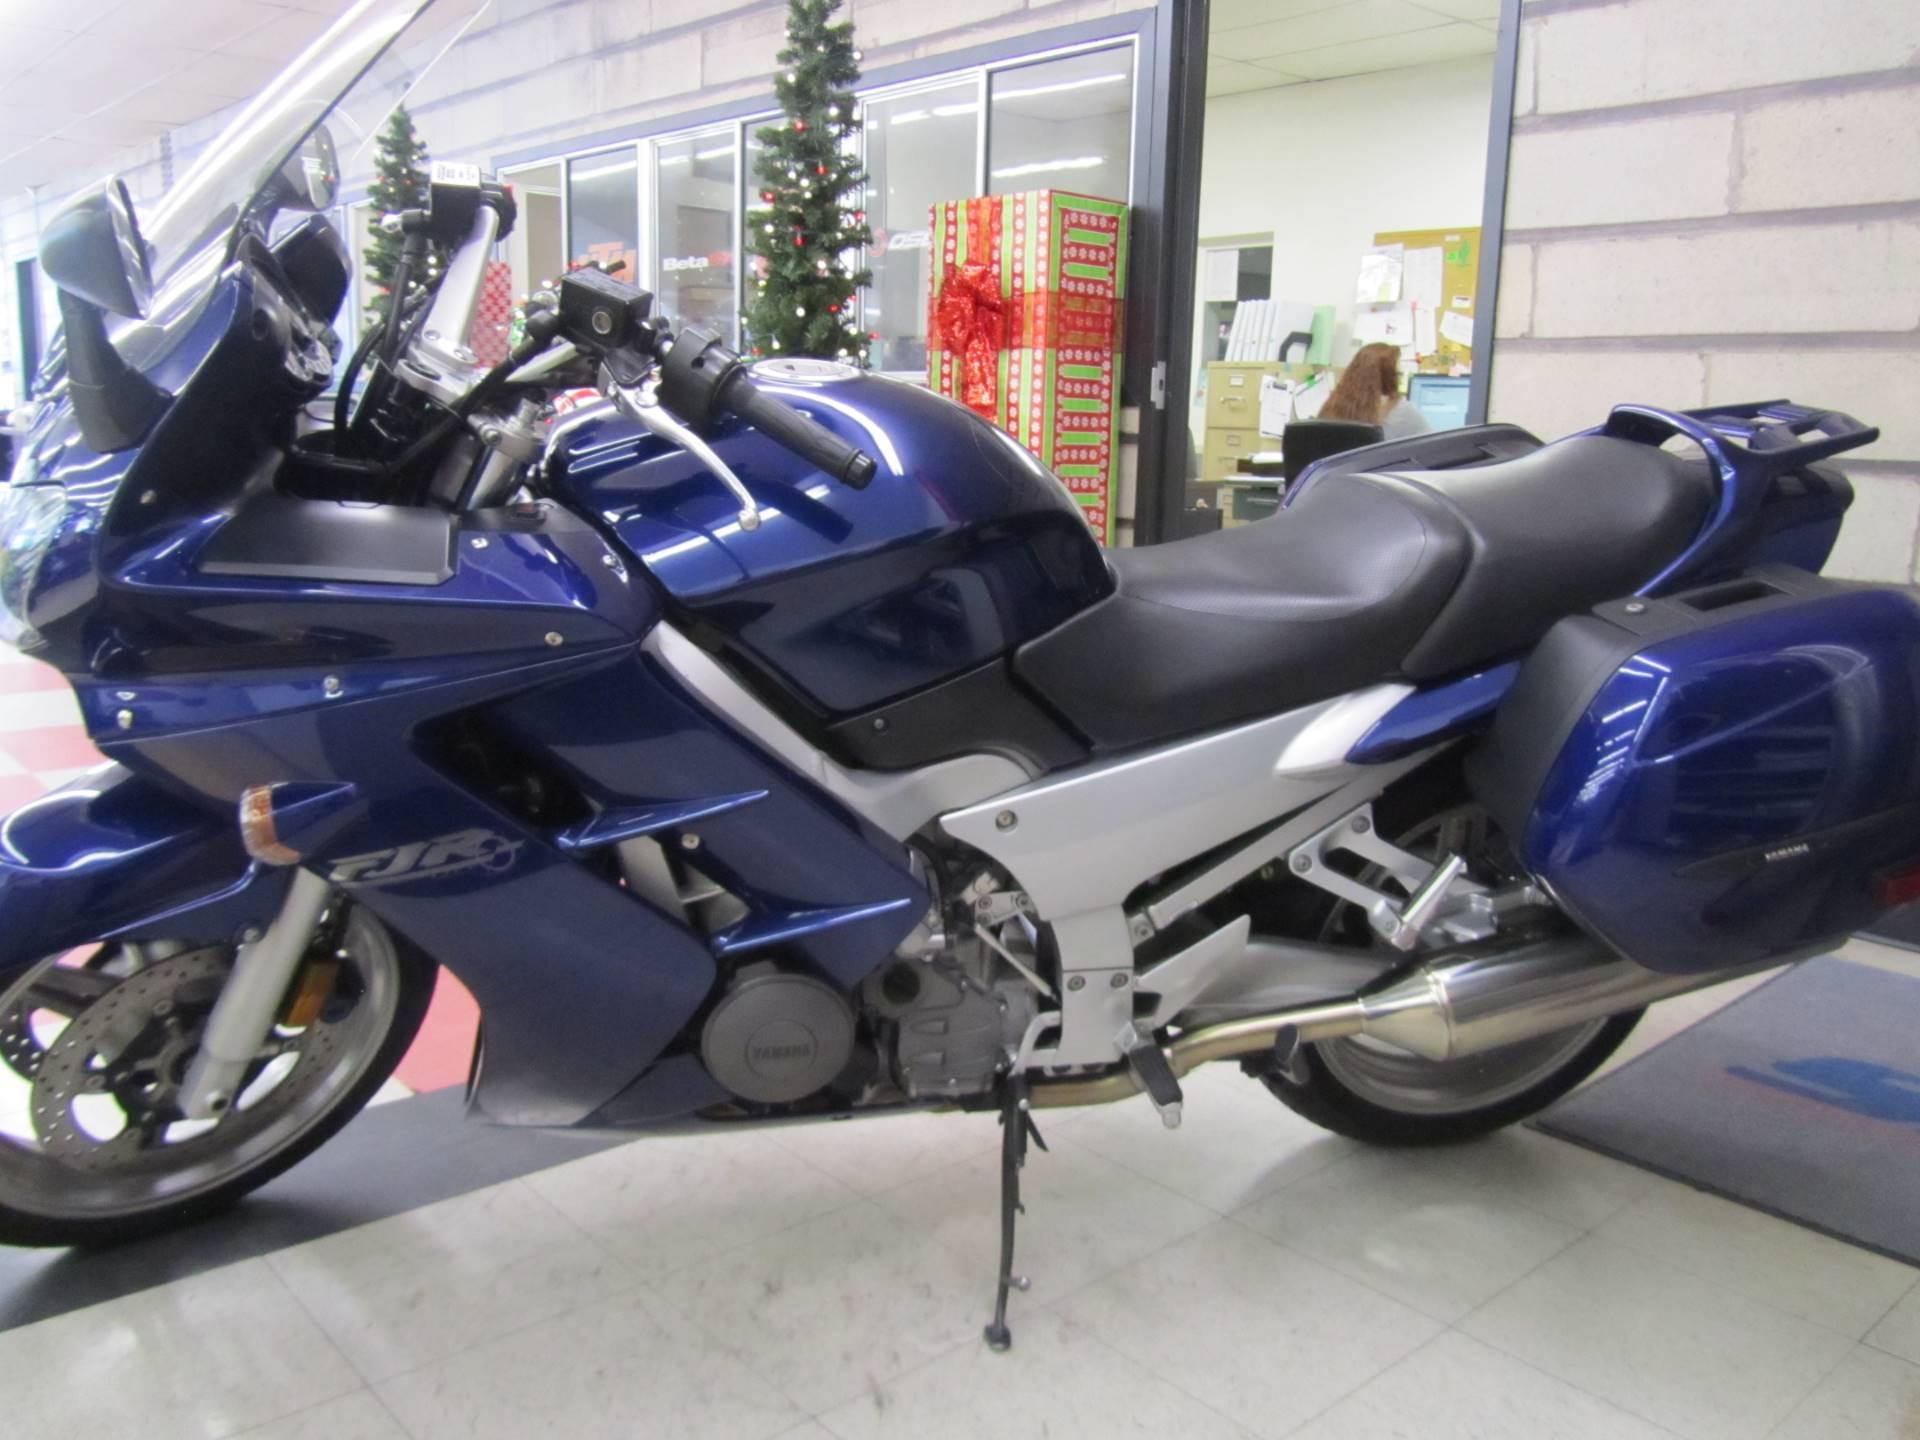 2005 Yamaha FJR 1300A 1